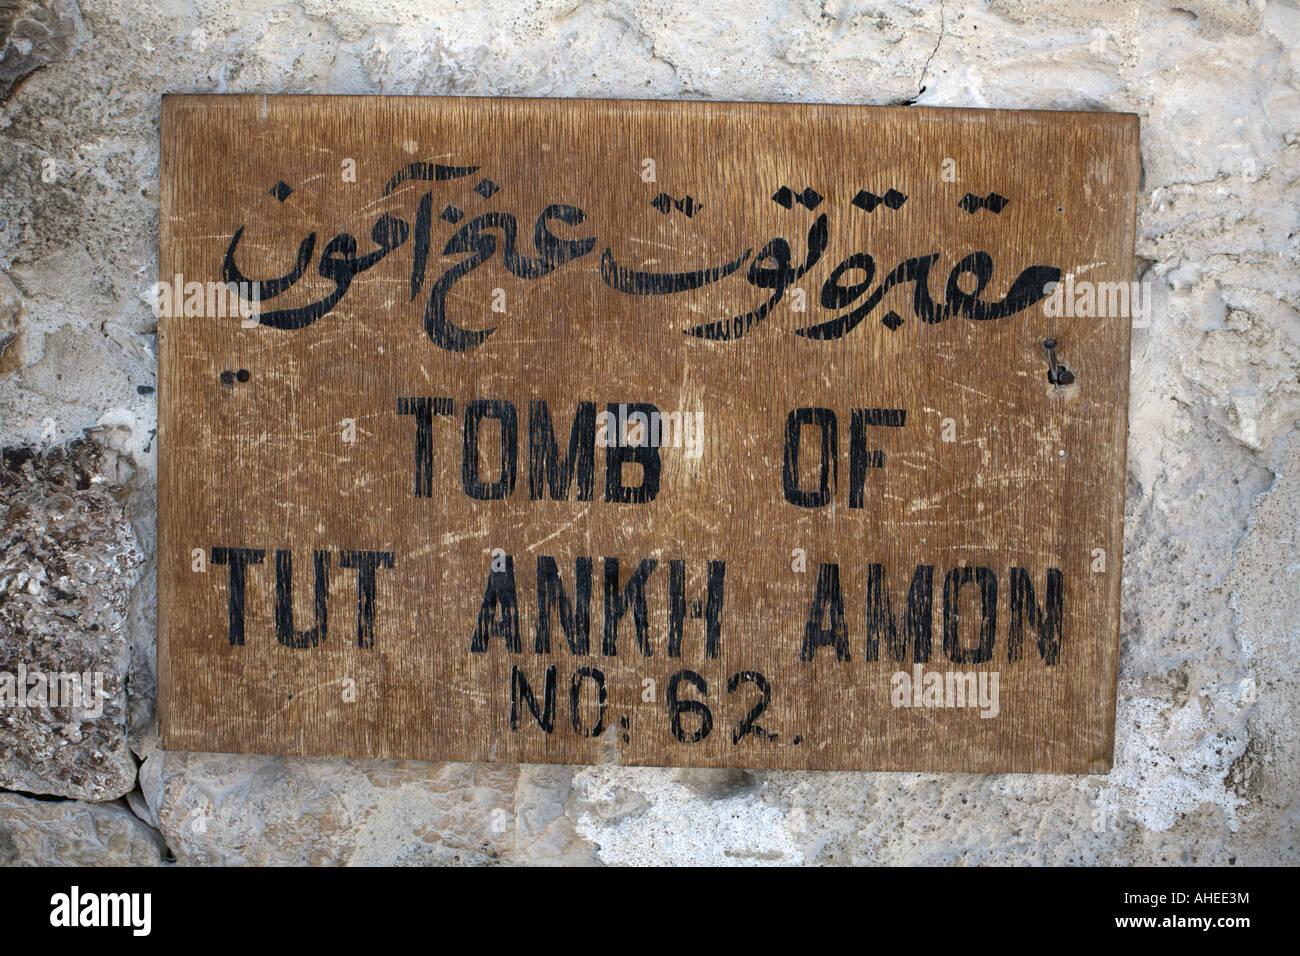 The tomb of Tutankhamun - Stock Image